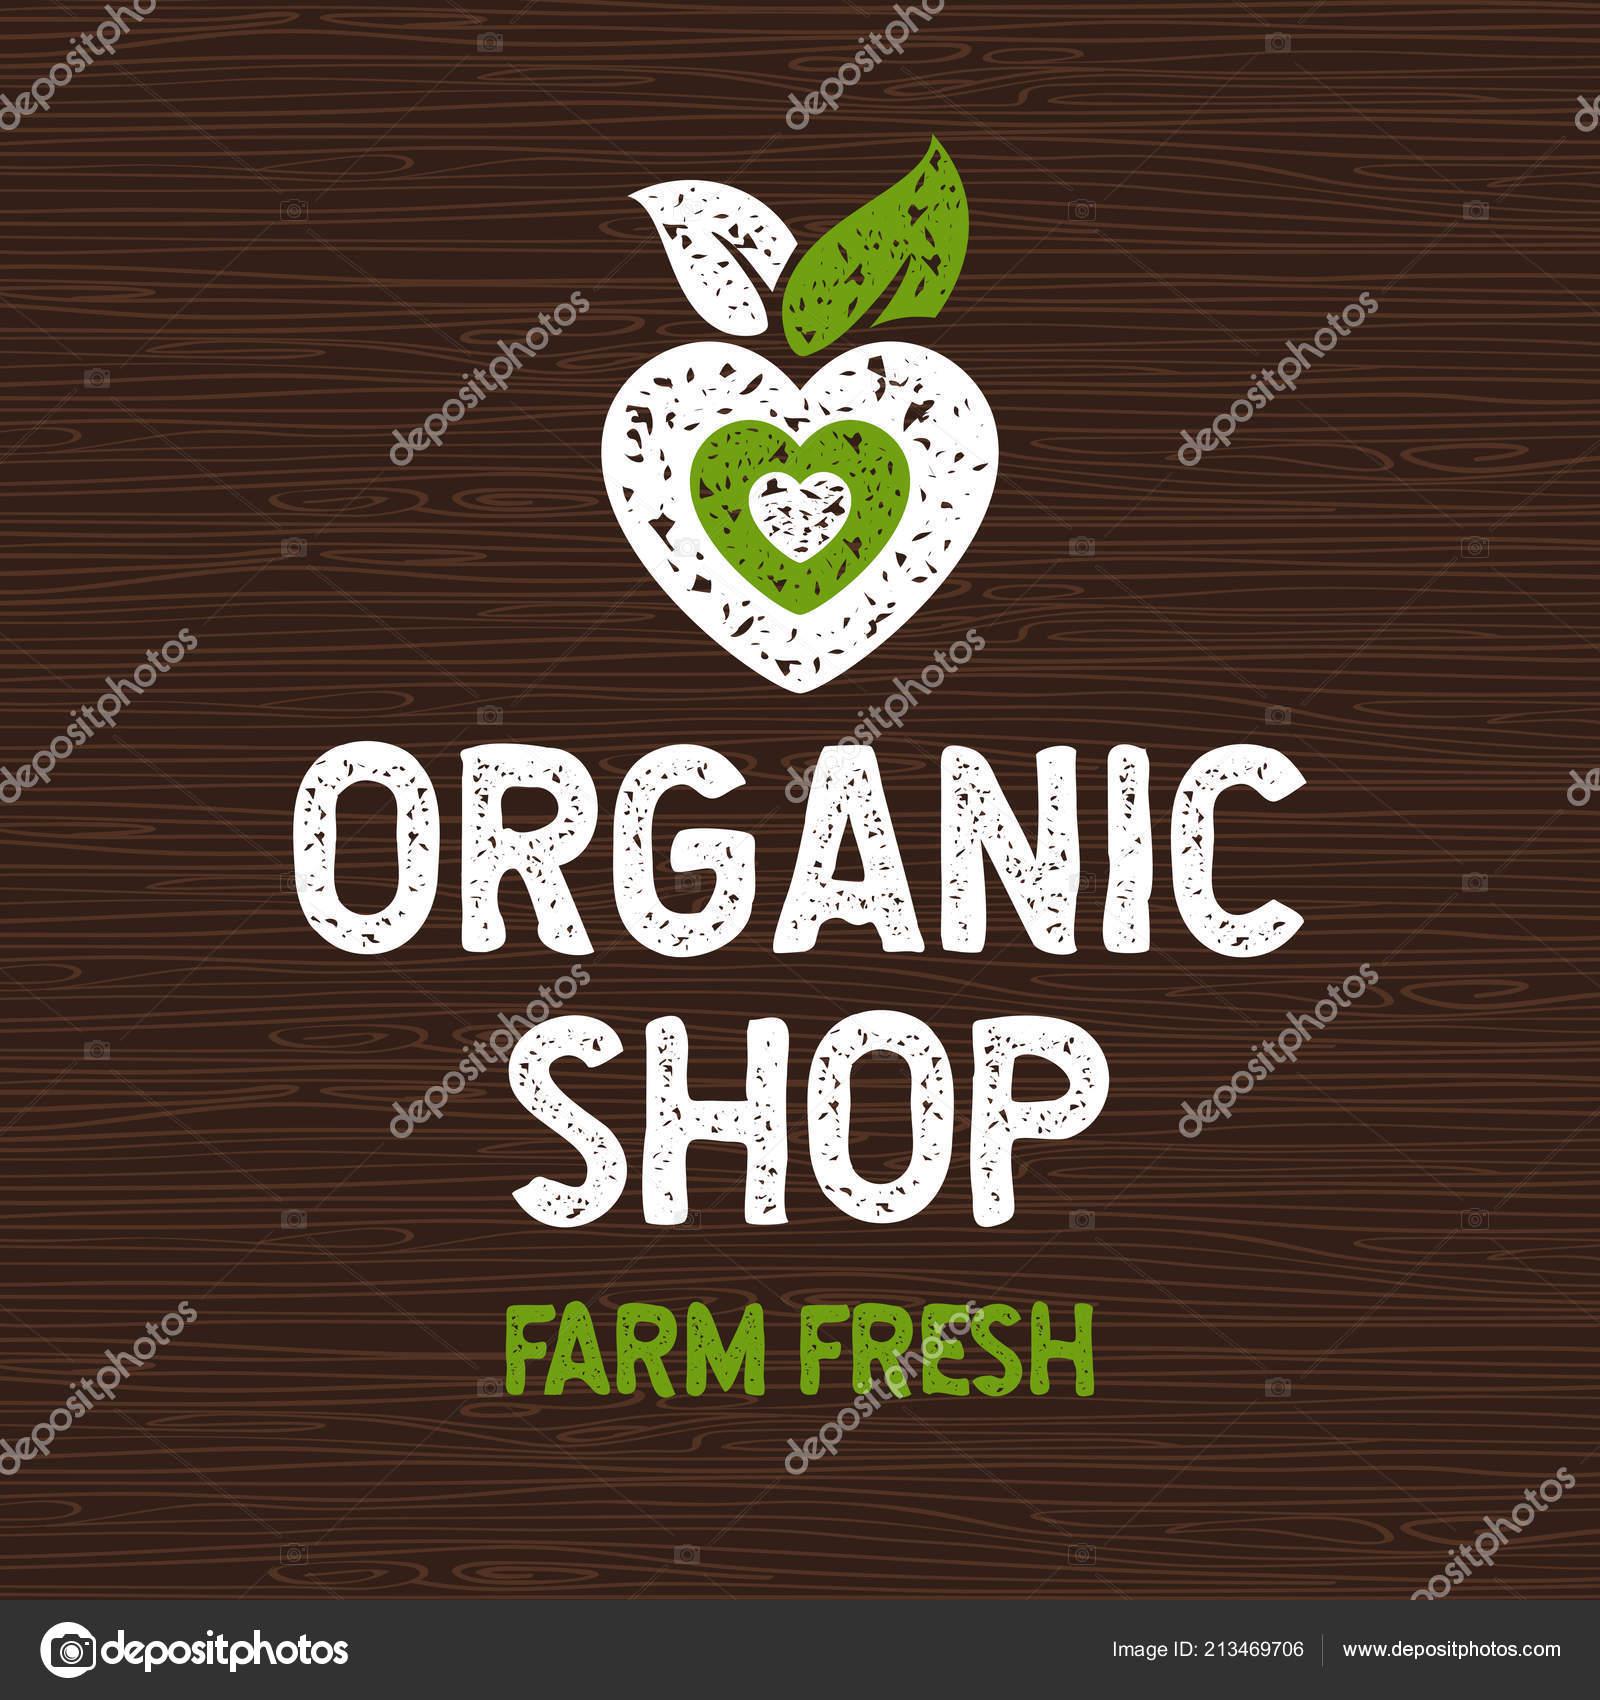 Organic Shop Logo Farm Fresh Food Label Cutting Board Rays Wood Elements Emblem For Eco Shop Restaurants Organic Products Stock Vector Vector Image By C Iraida Bearlala Vector Stock 213469706